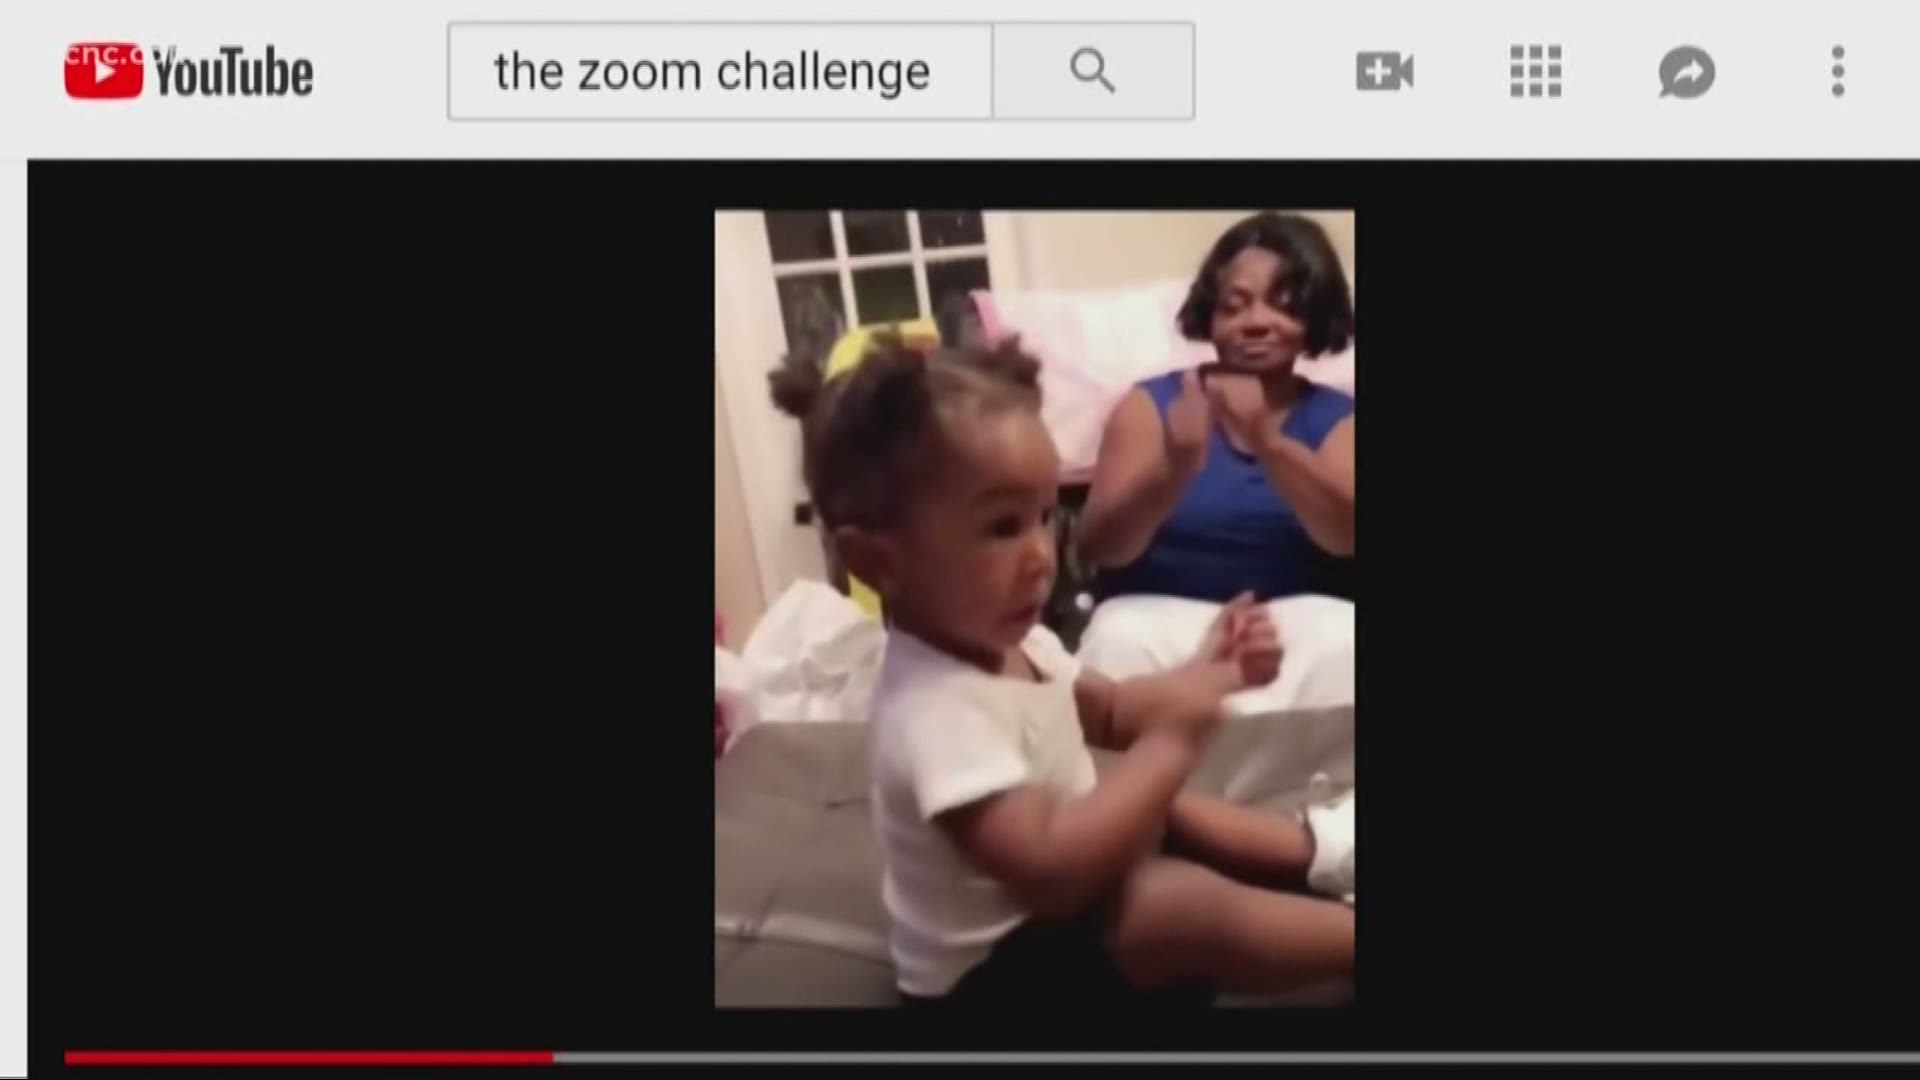 Zoom Challenge Posing Serious Health Risks 12newsnow Com